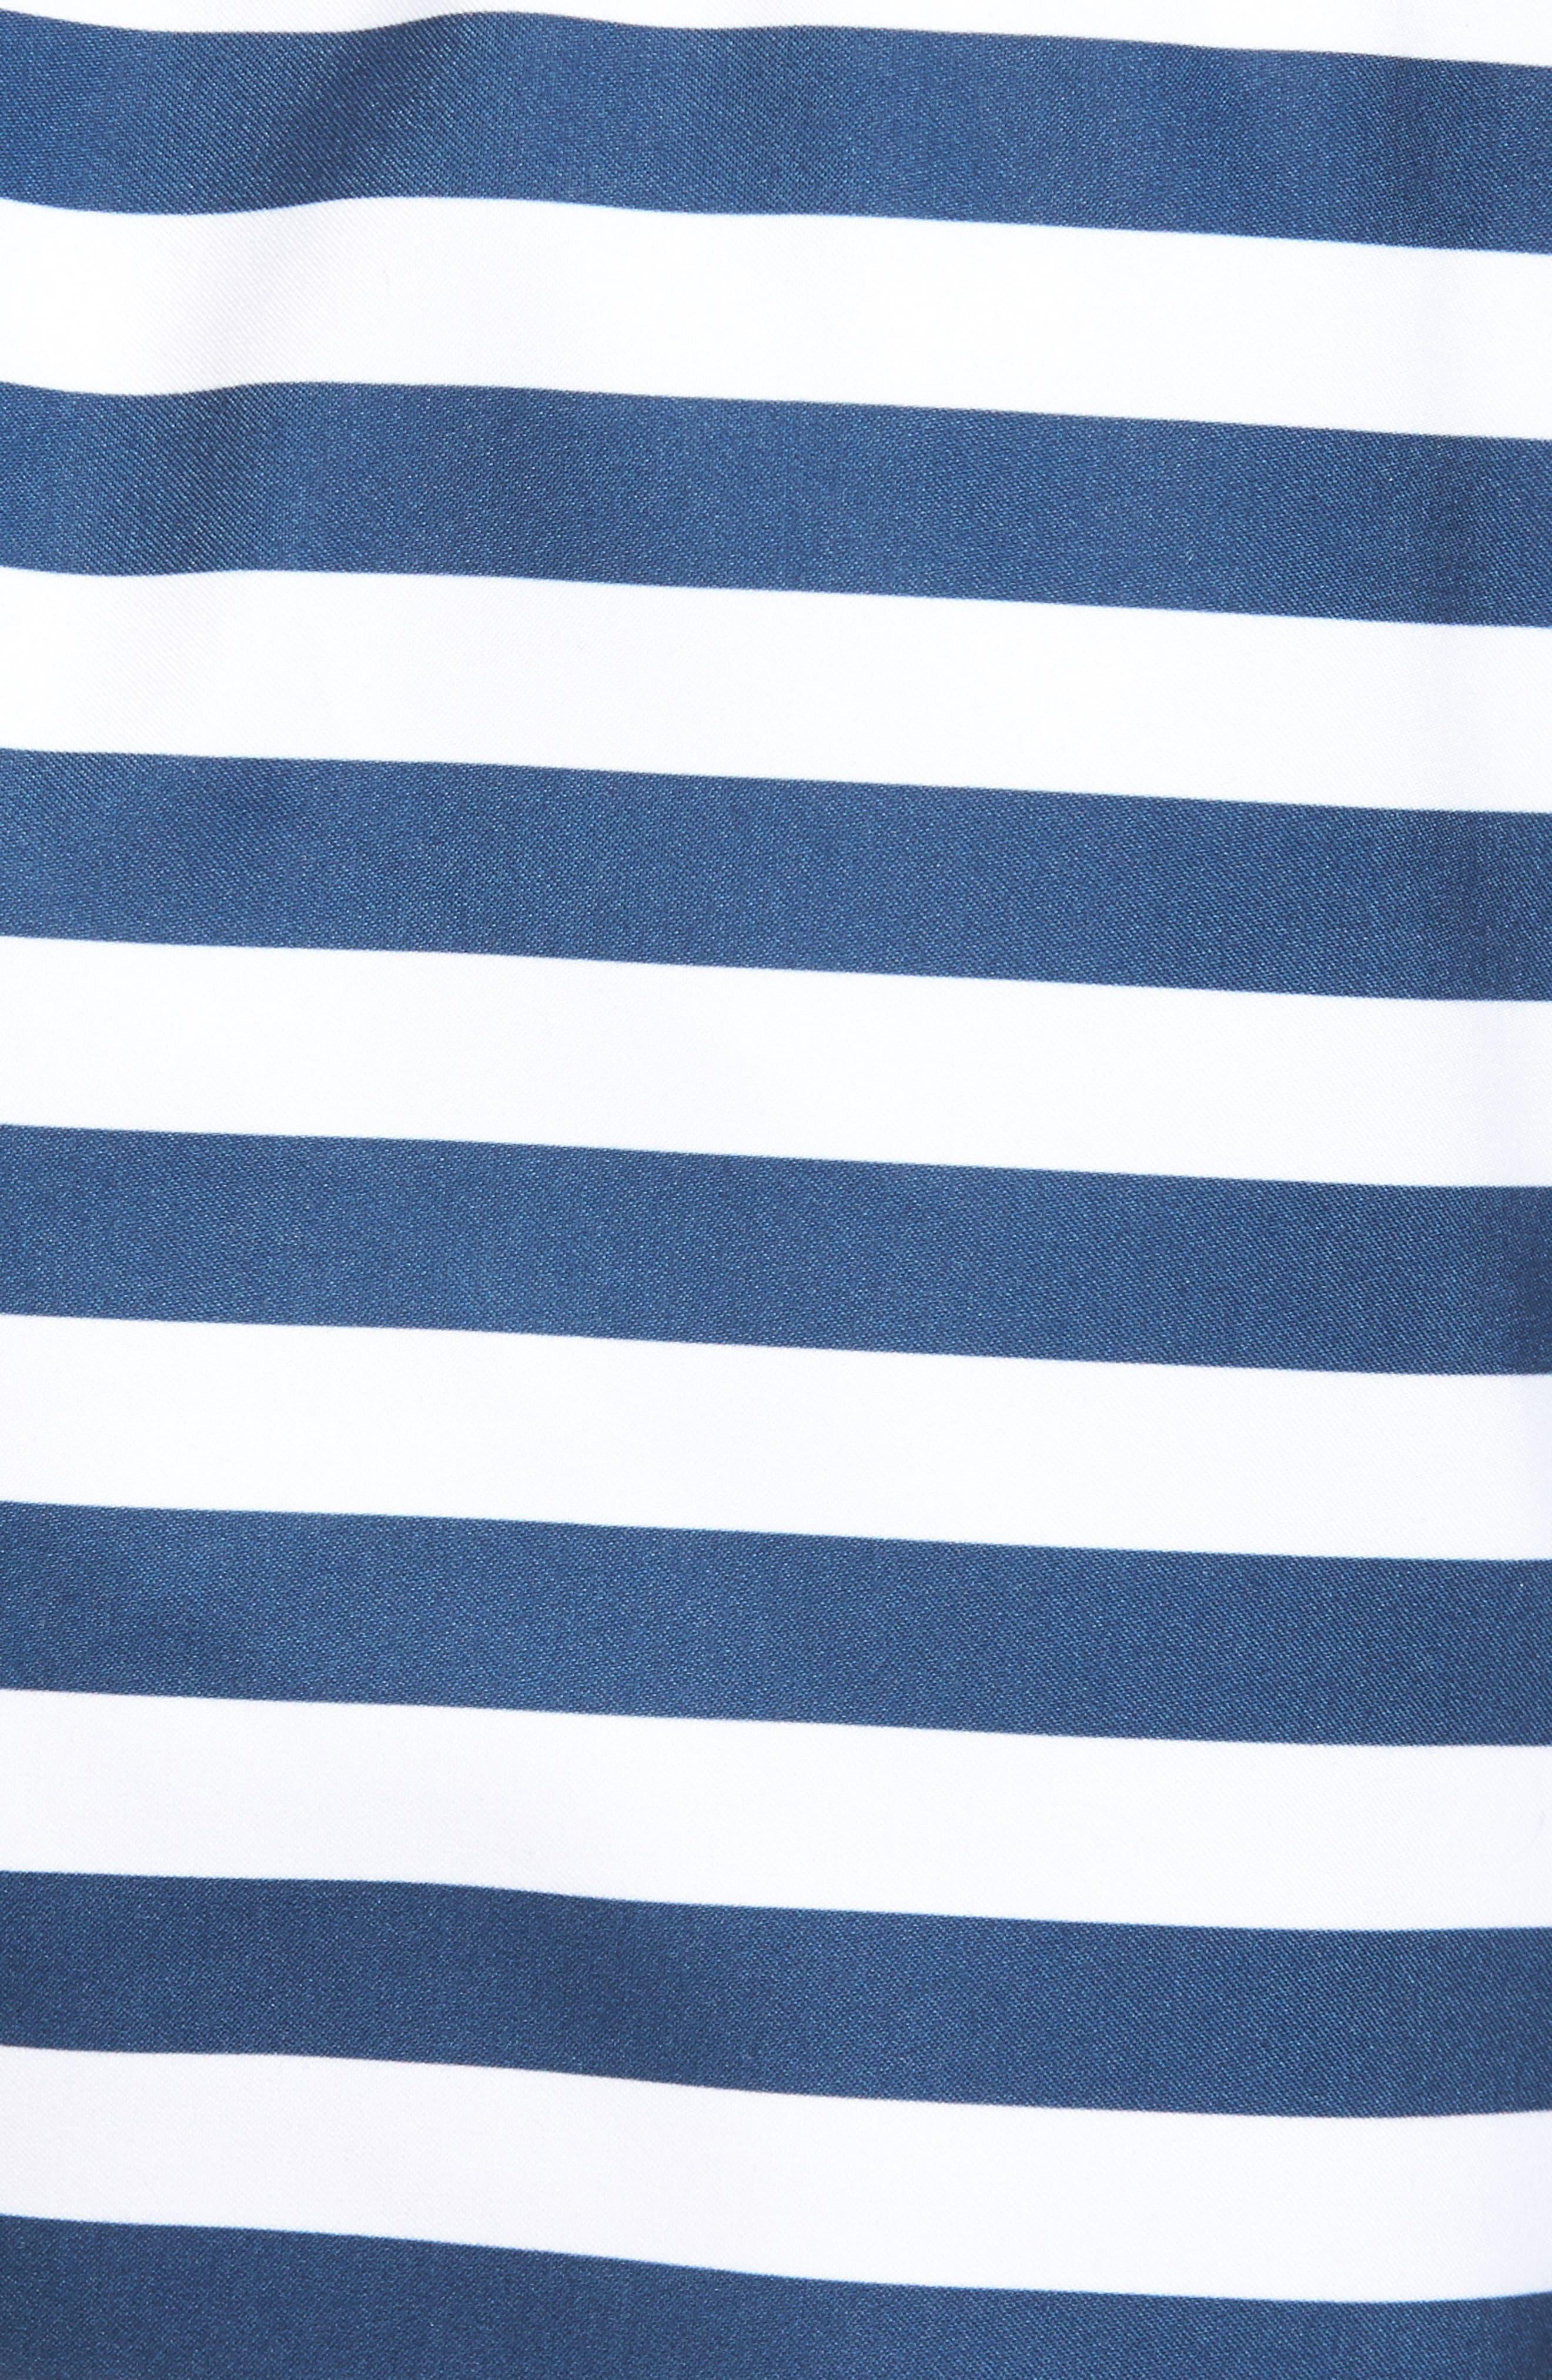 Abalone Swim Trunks,                             Alternate thumbnail 5, color,                             Blue